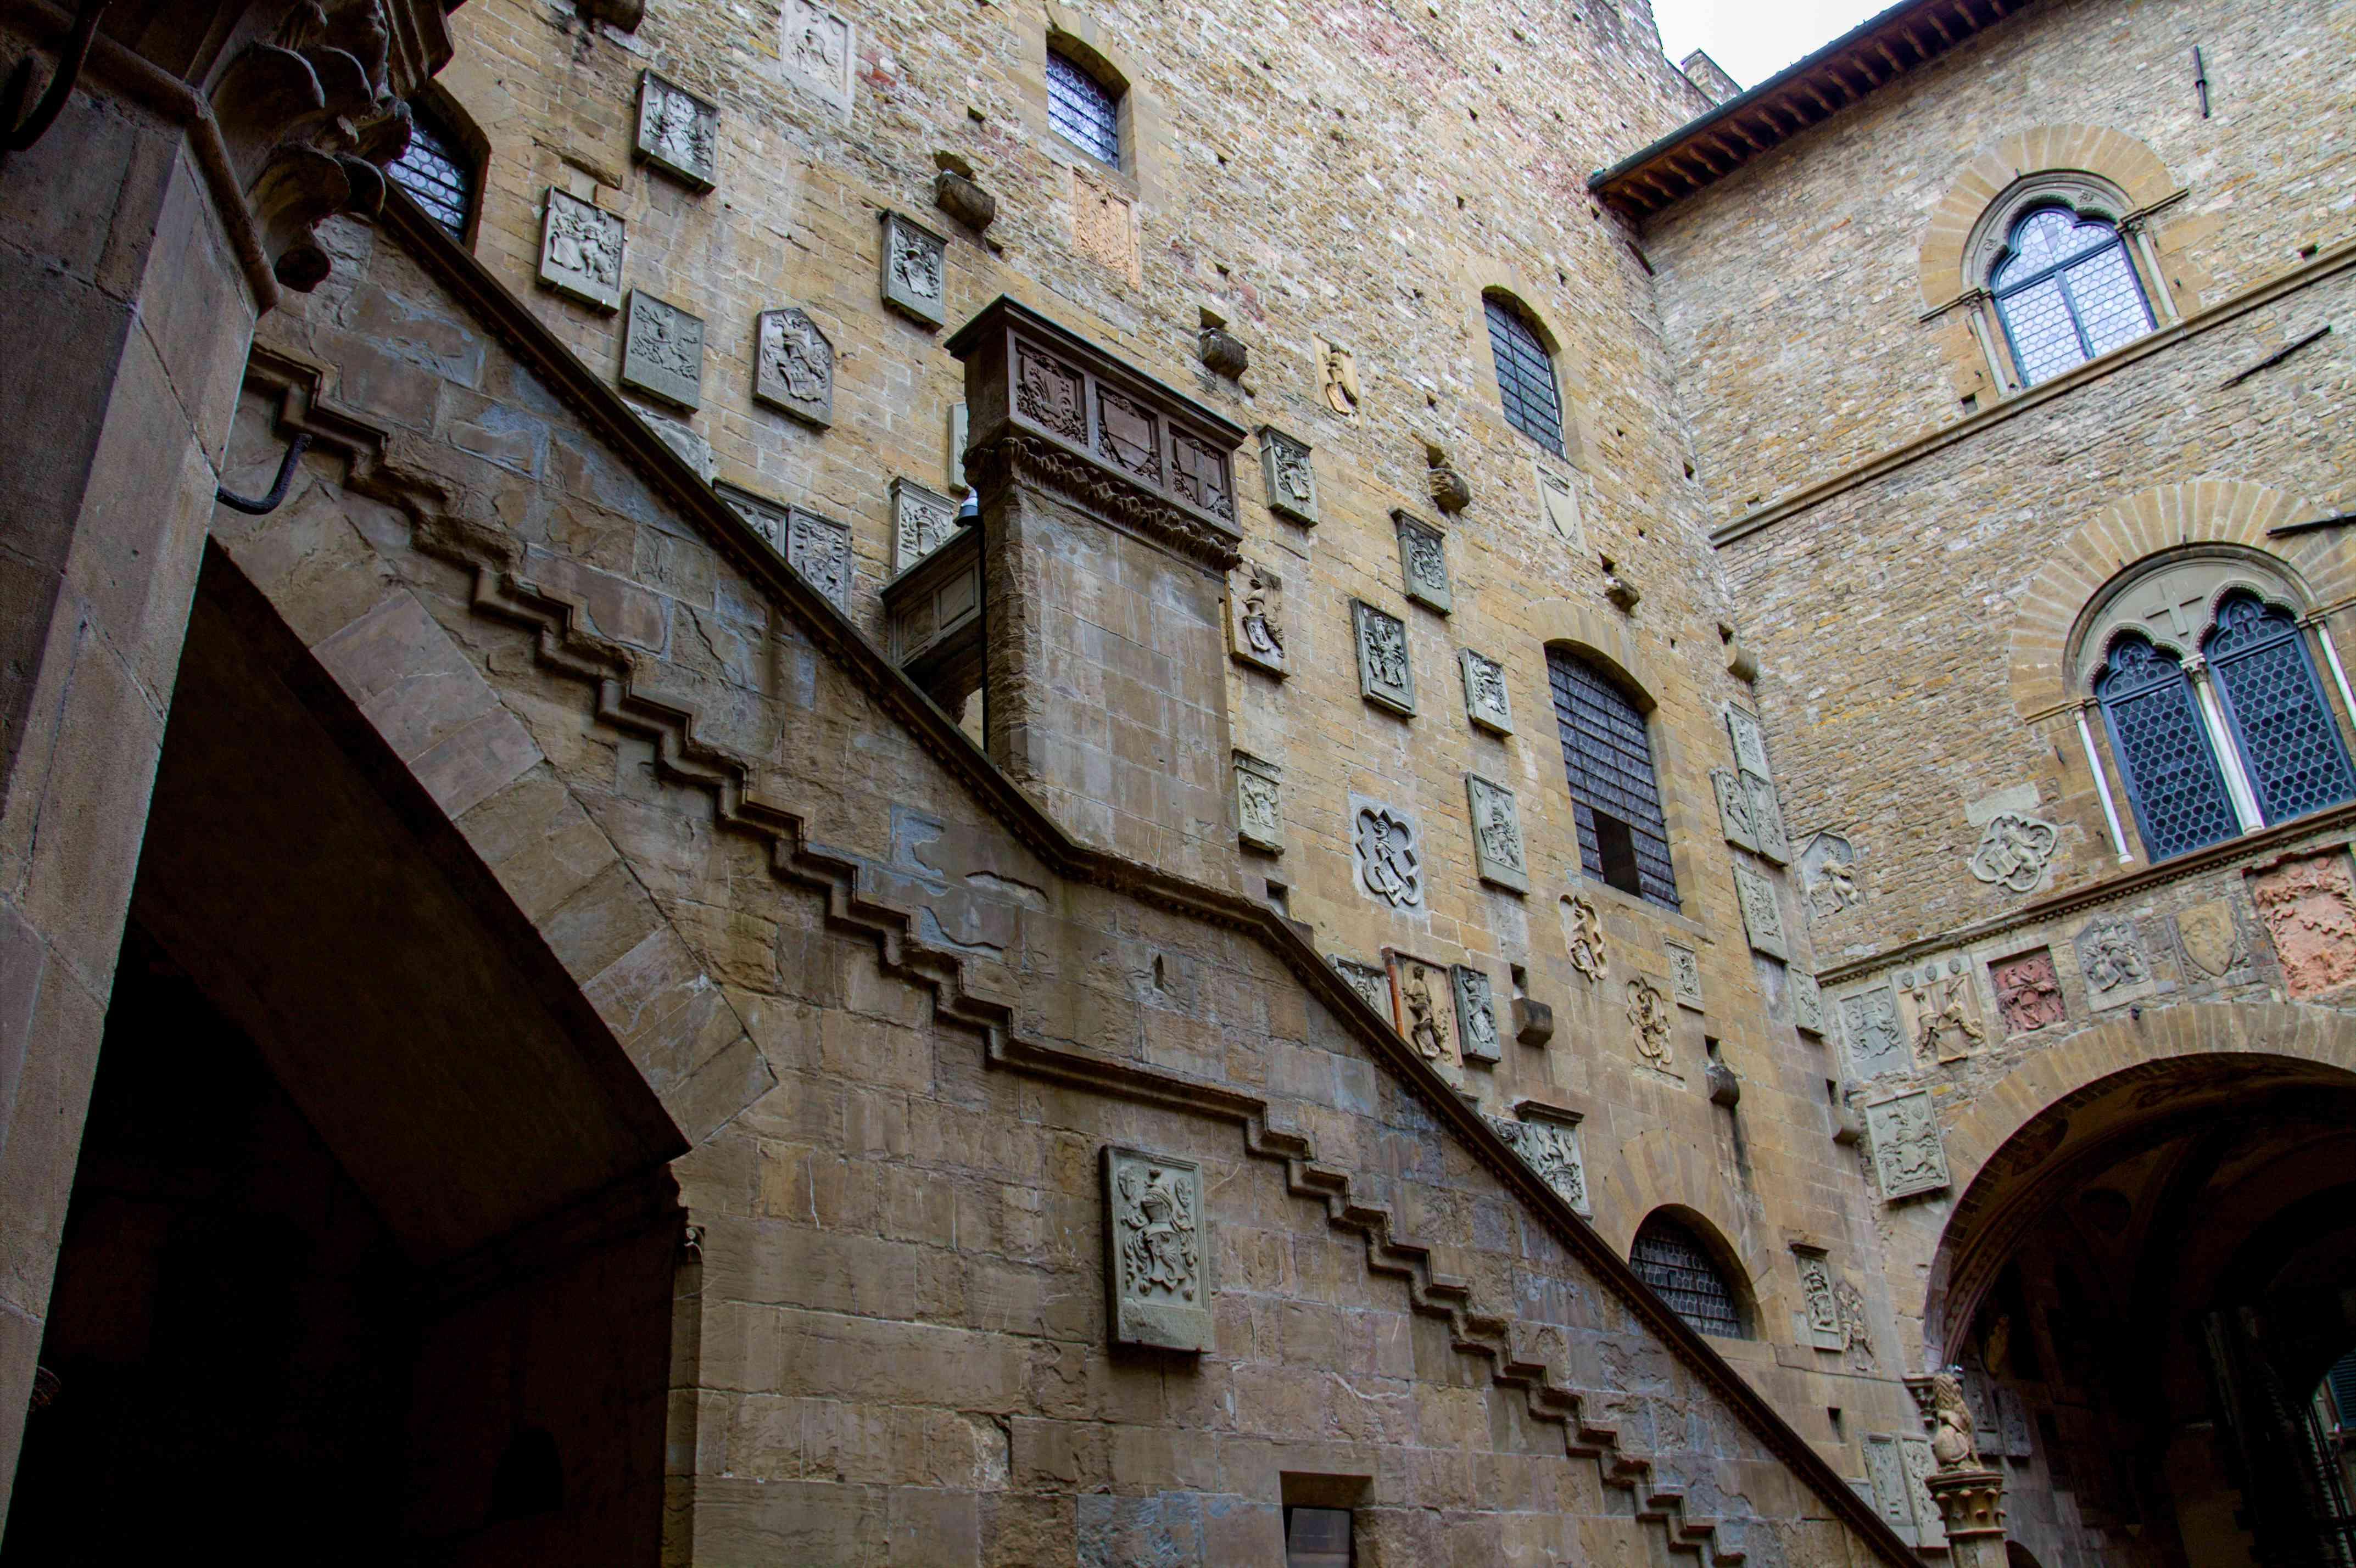 Museo Nazionale del Bargello in Florence